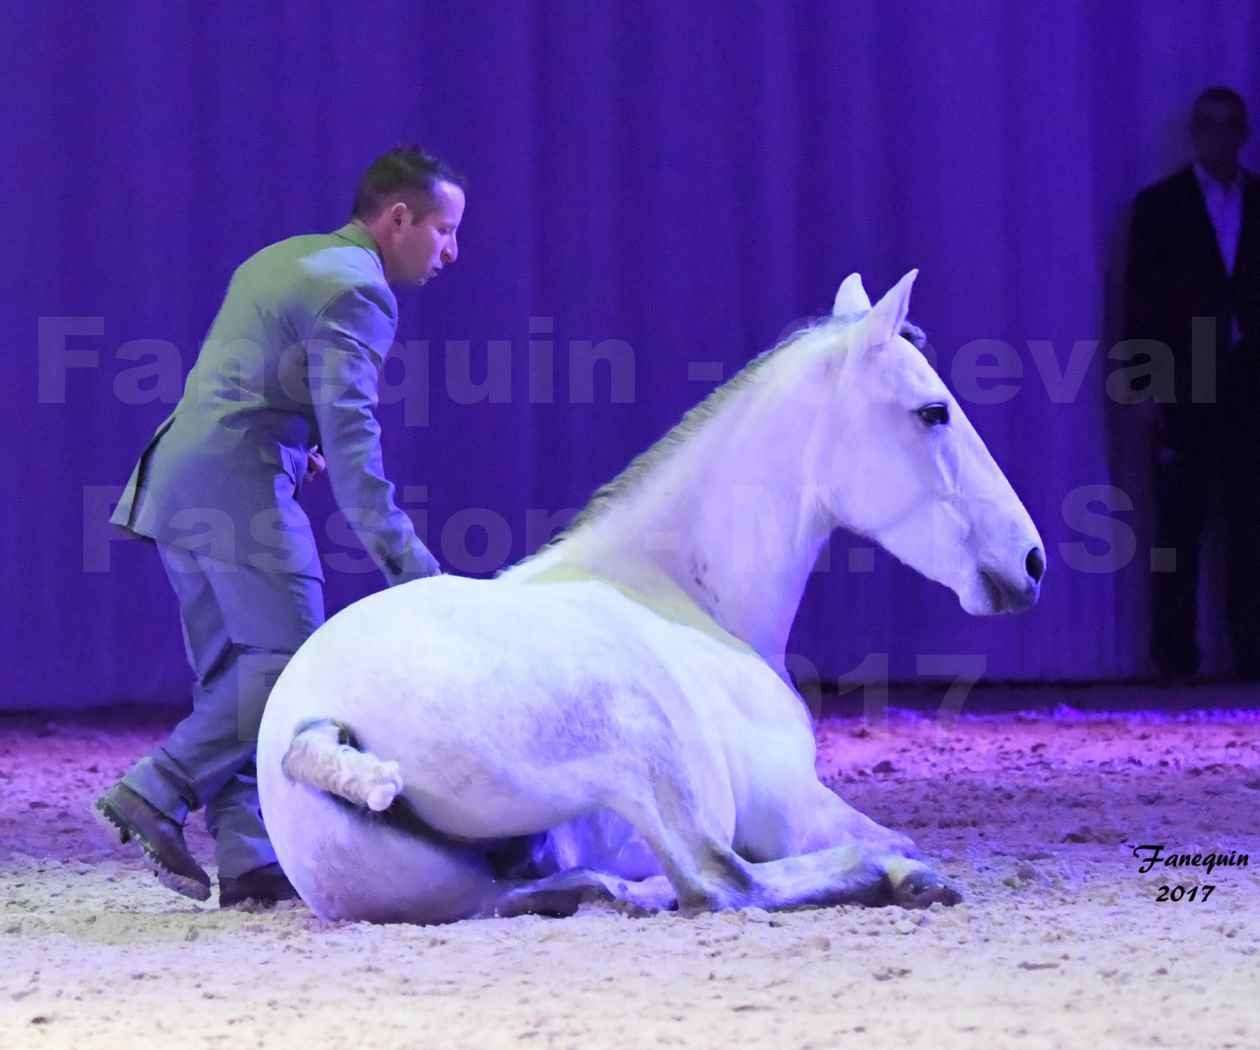 Cheval Passion 2017 - M. I. S. E. C. - Ludovic LONGO & 1 cheval en liberté - 17